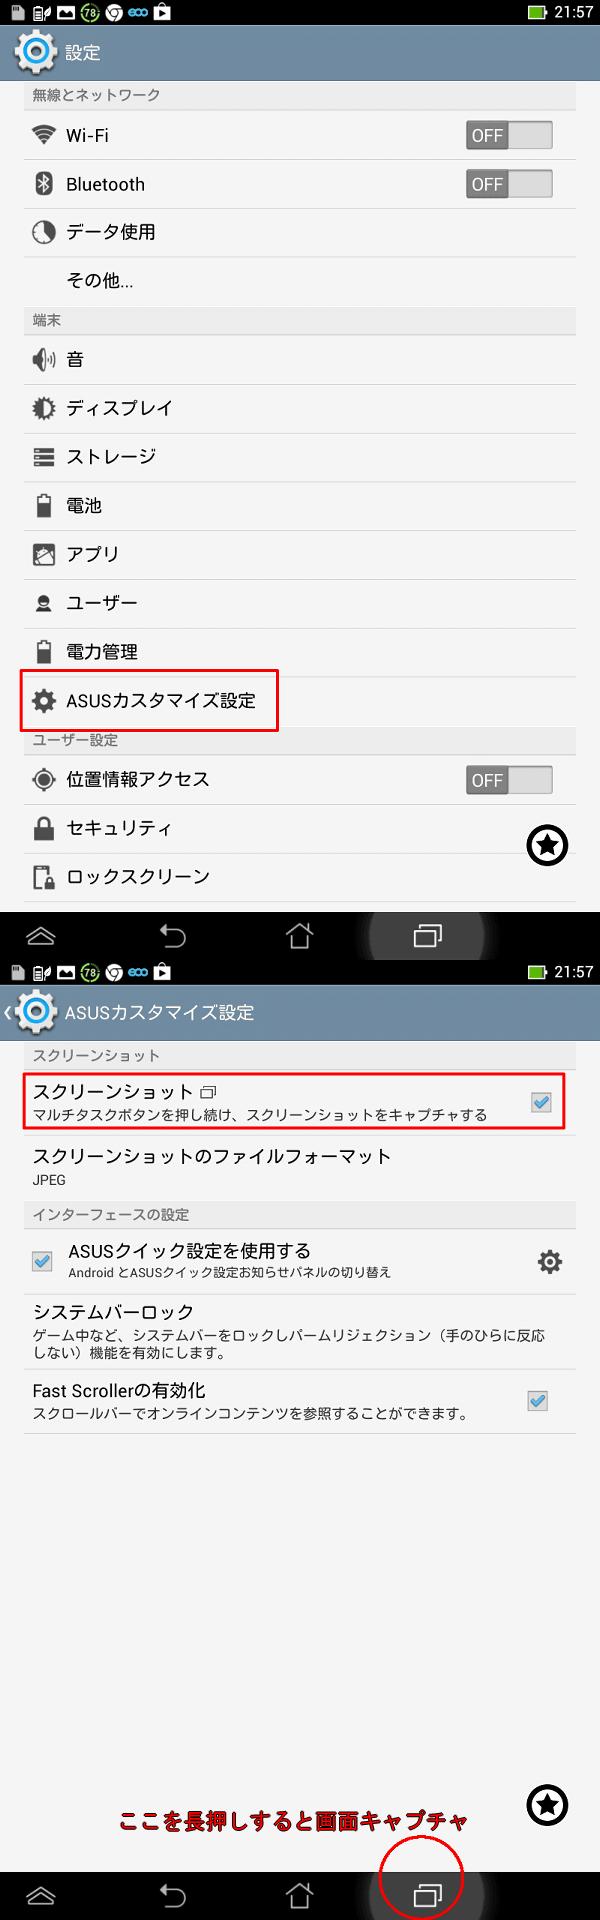 ME180-GY16_ScreenShot_001.png